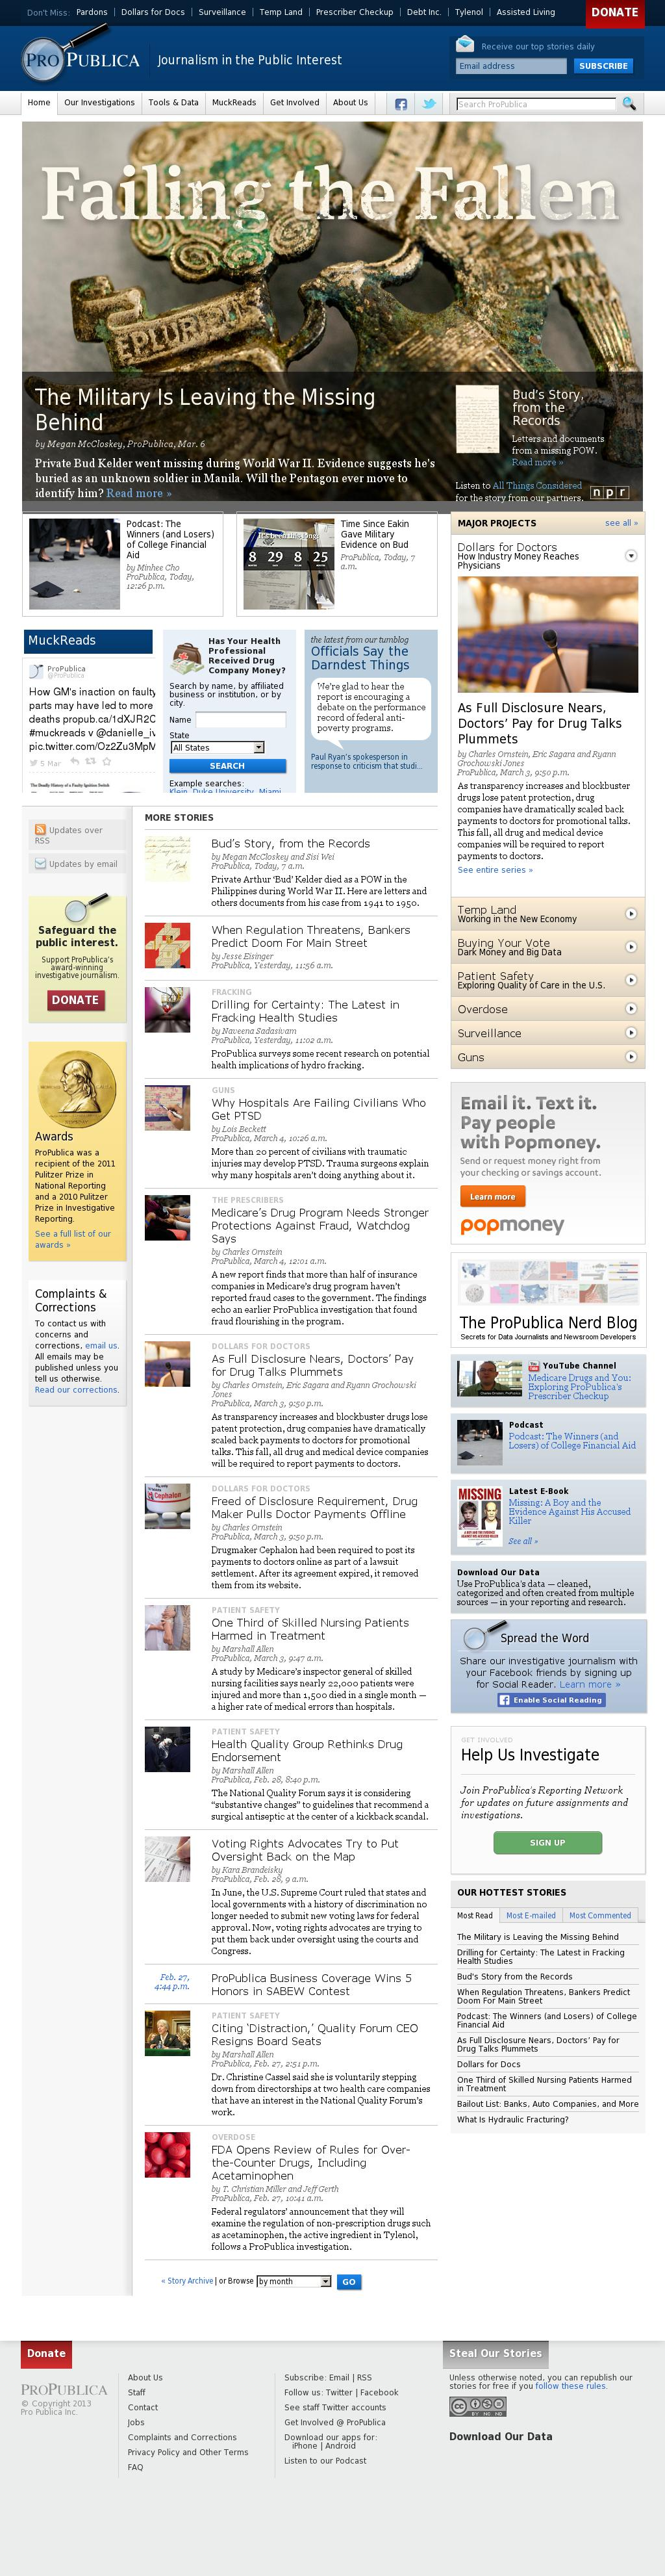 ProPublica at Thursday March 6, 2014, 9:14 p.m. UTC